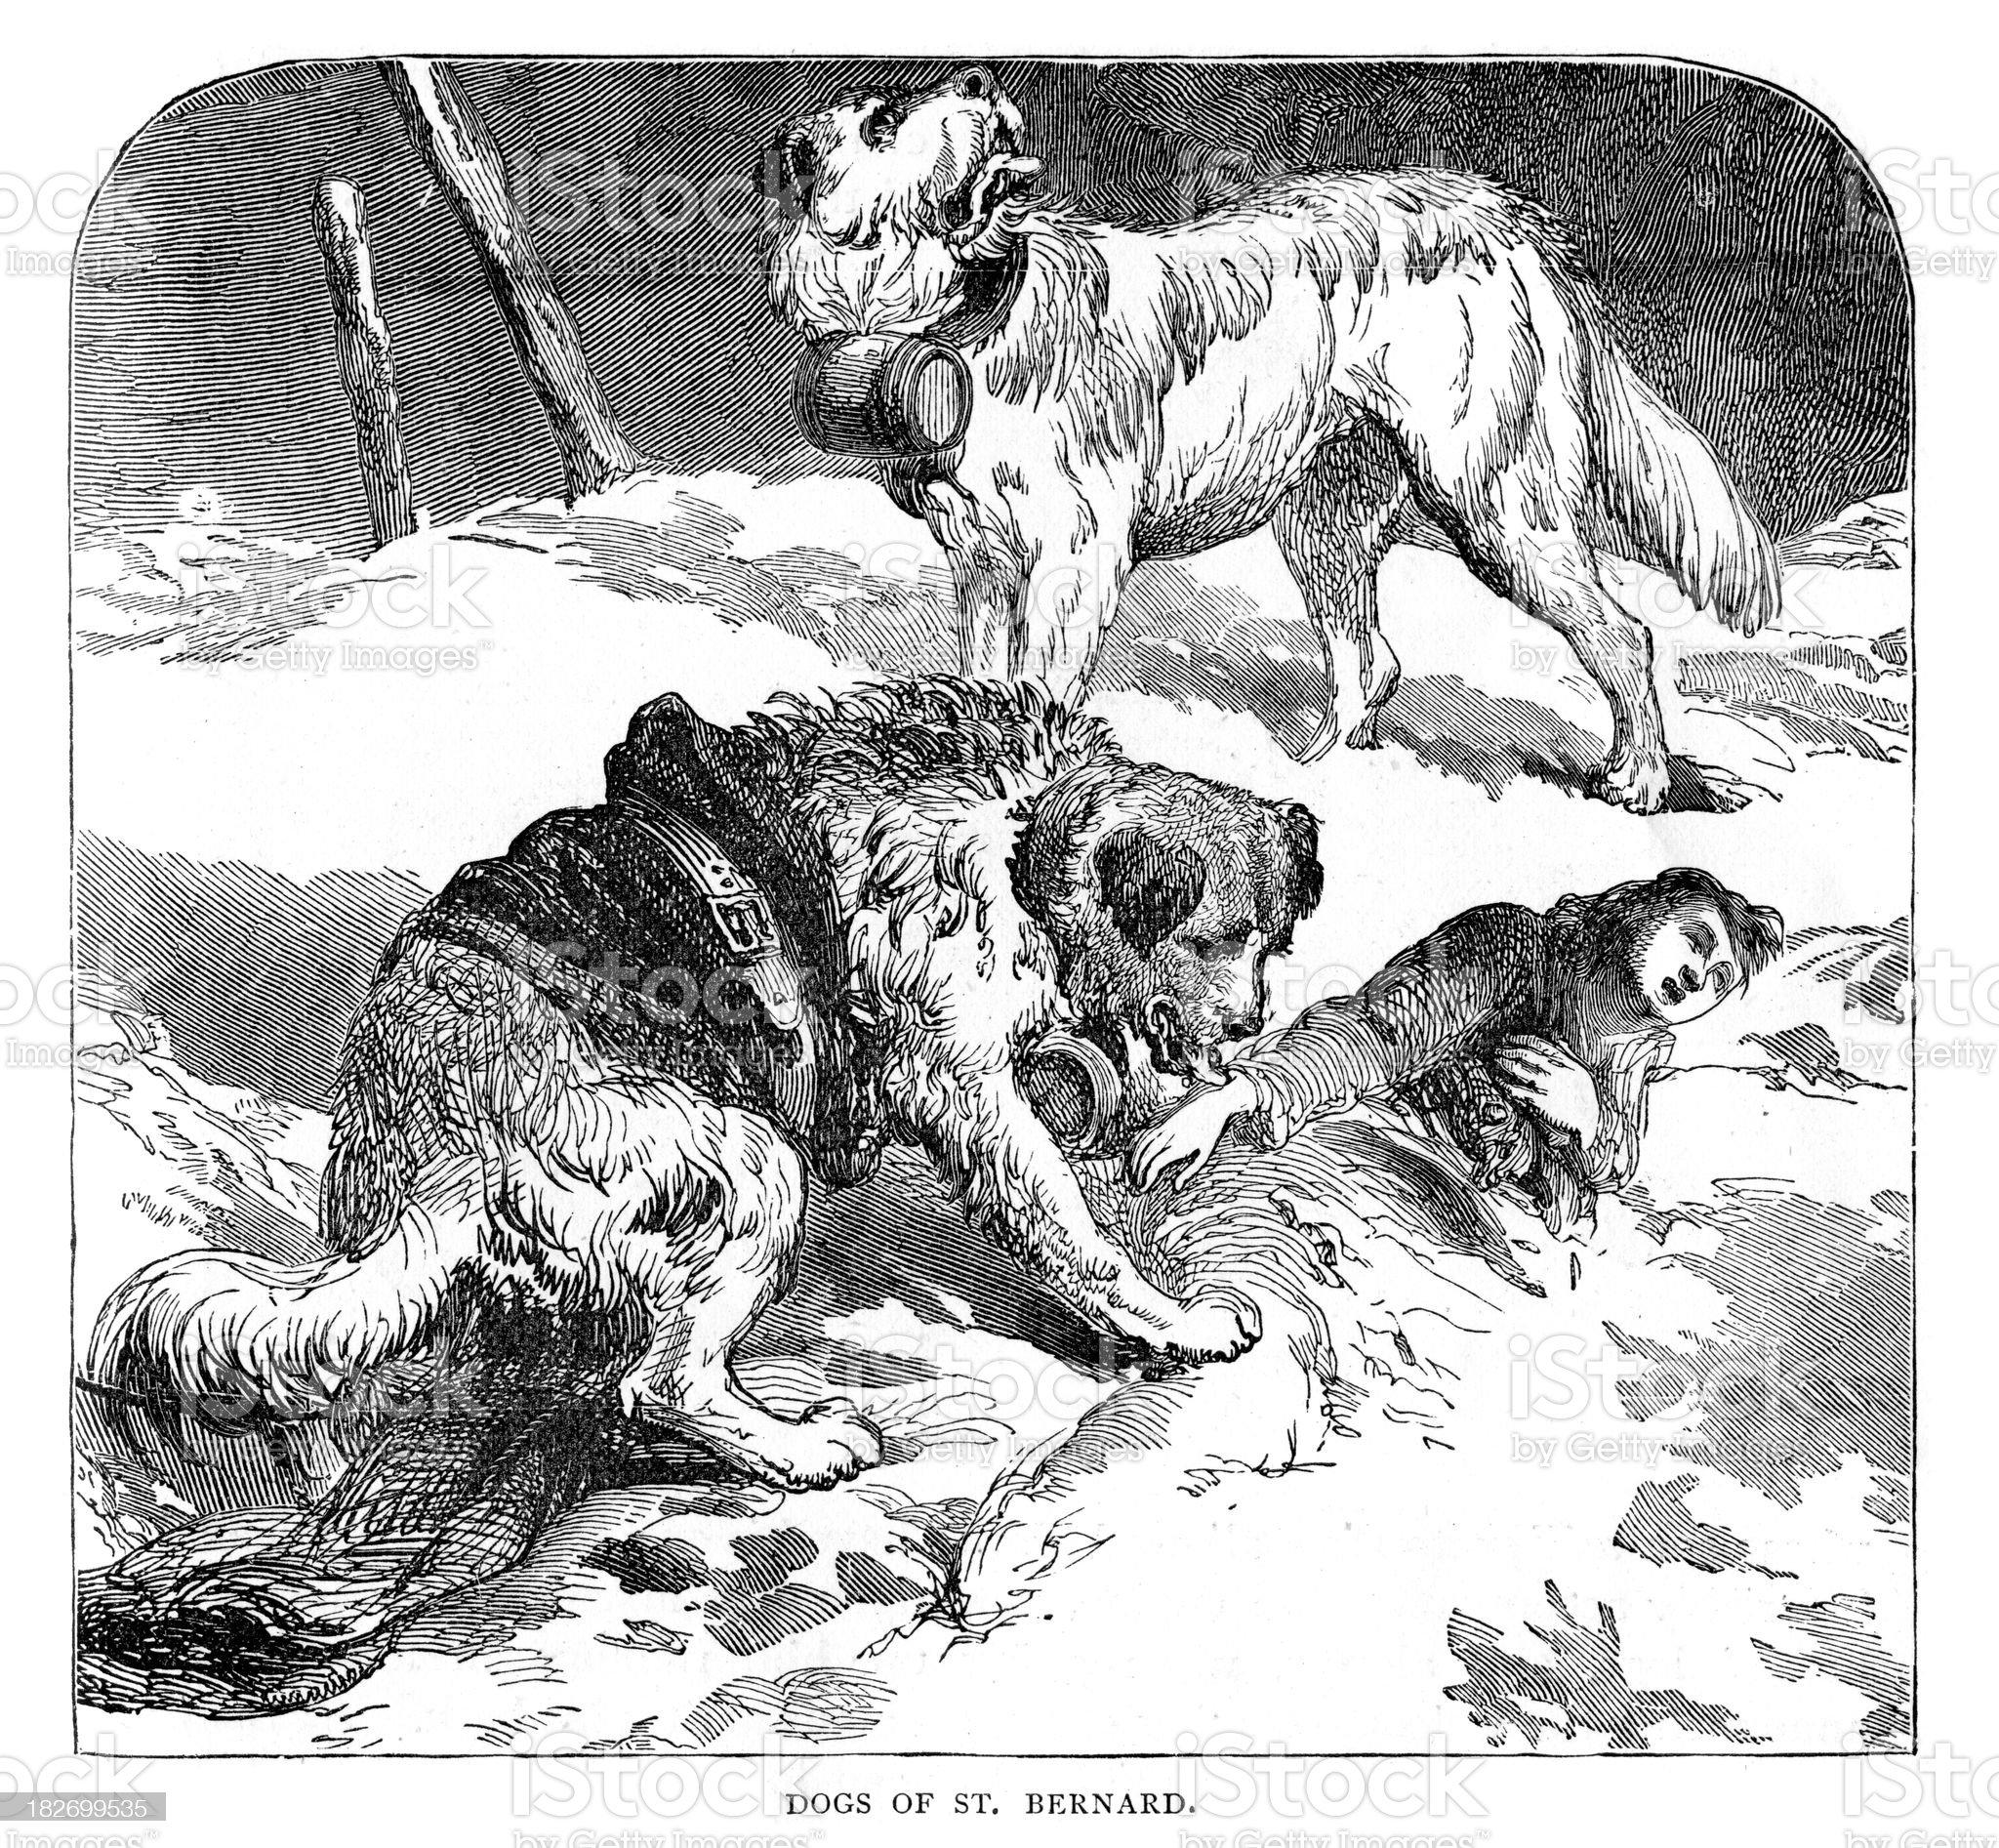 Dogs of St Bernard royalty-free stock vector art